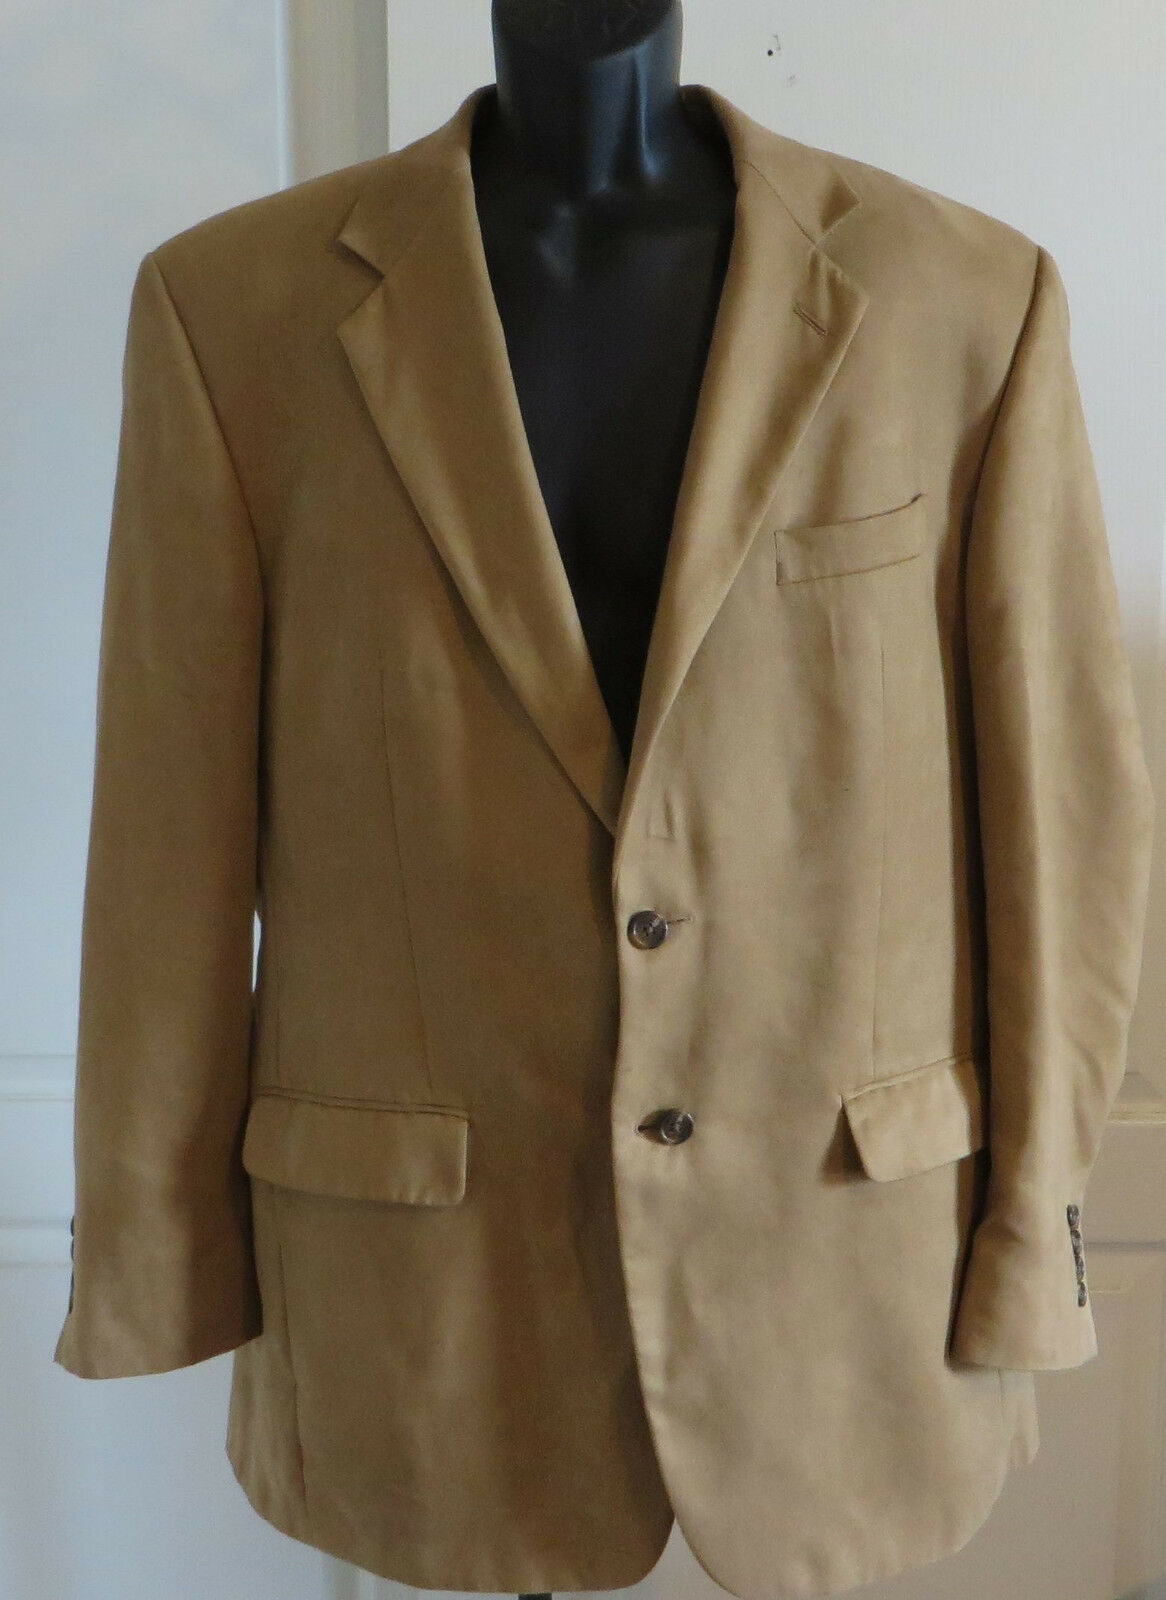 Chaps by Ralph Lauren Mens Microfiber Blazer Size 42L Tan Sport Coat